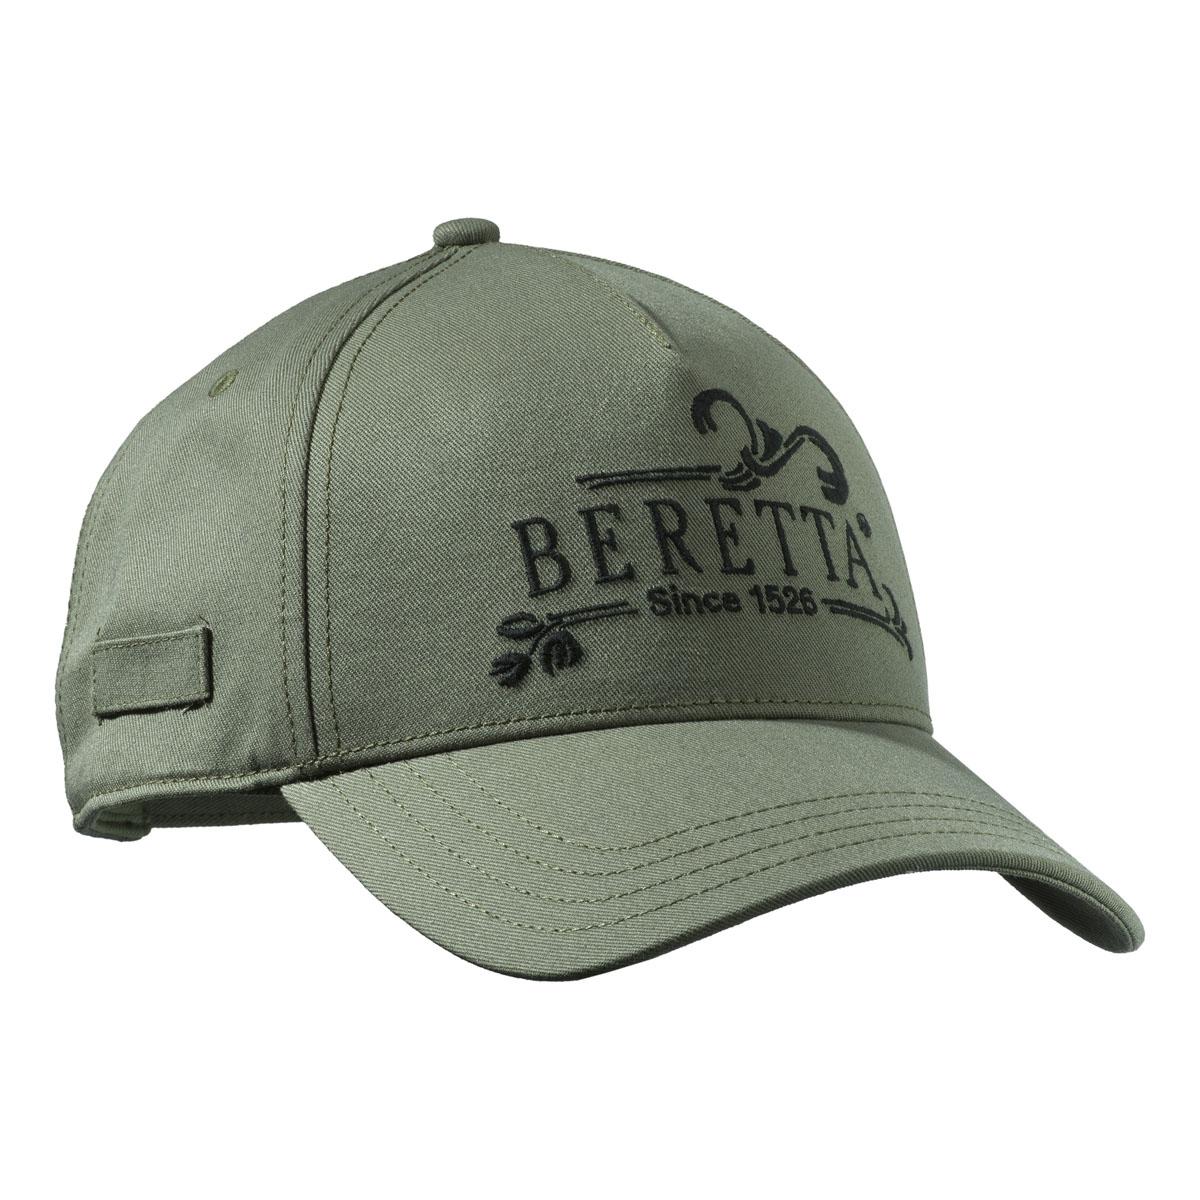 Image of Beretta Since 1526 Cap - Green b528a8d88885